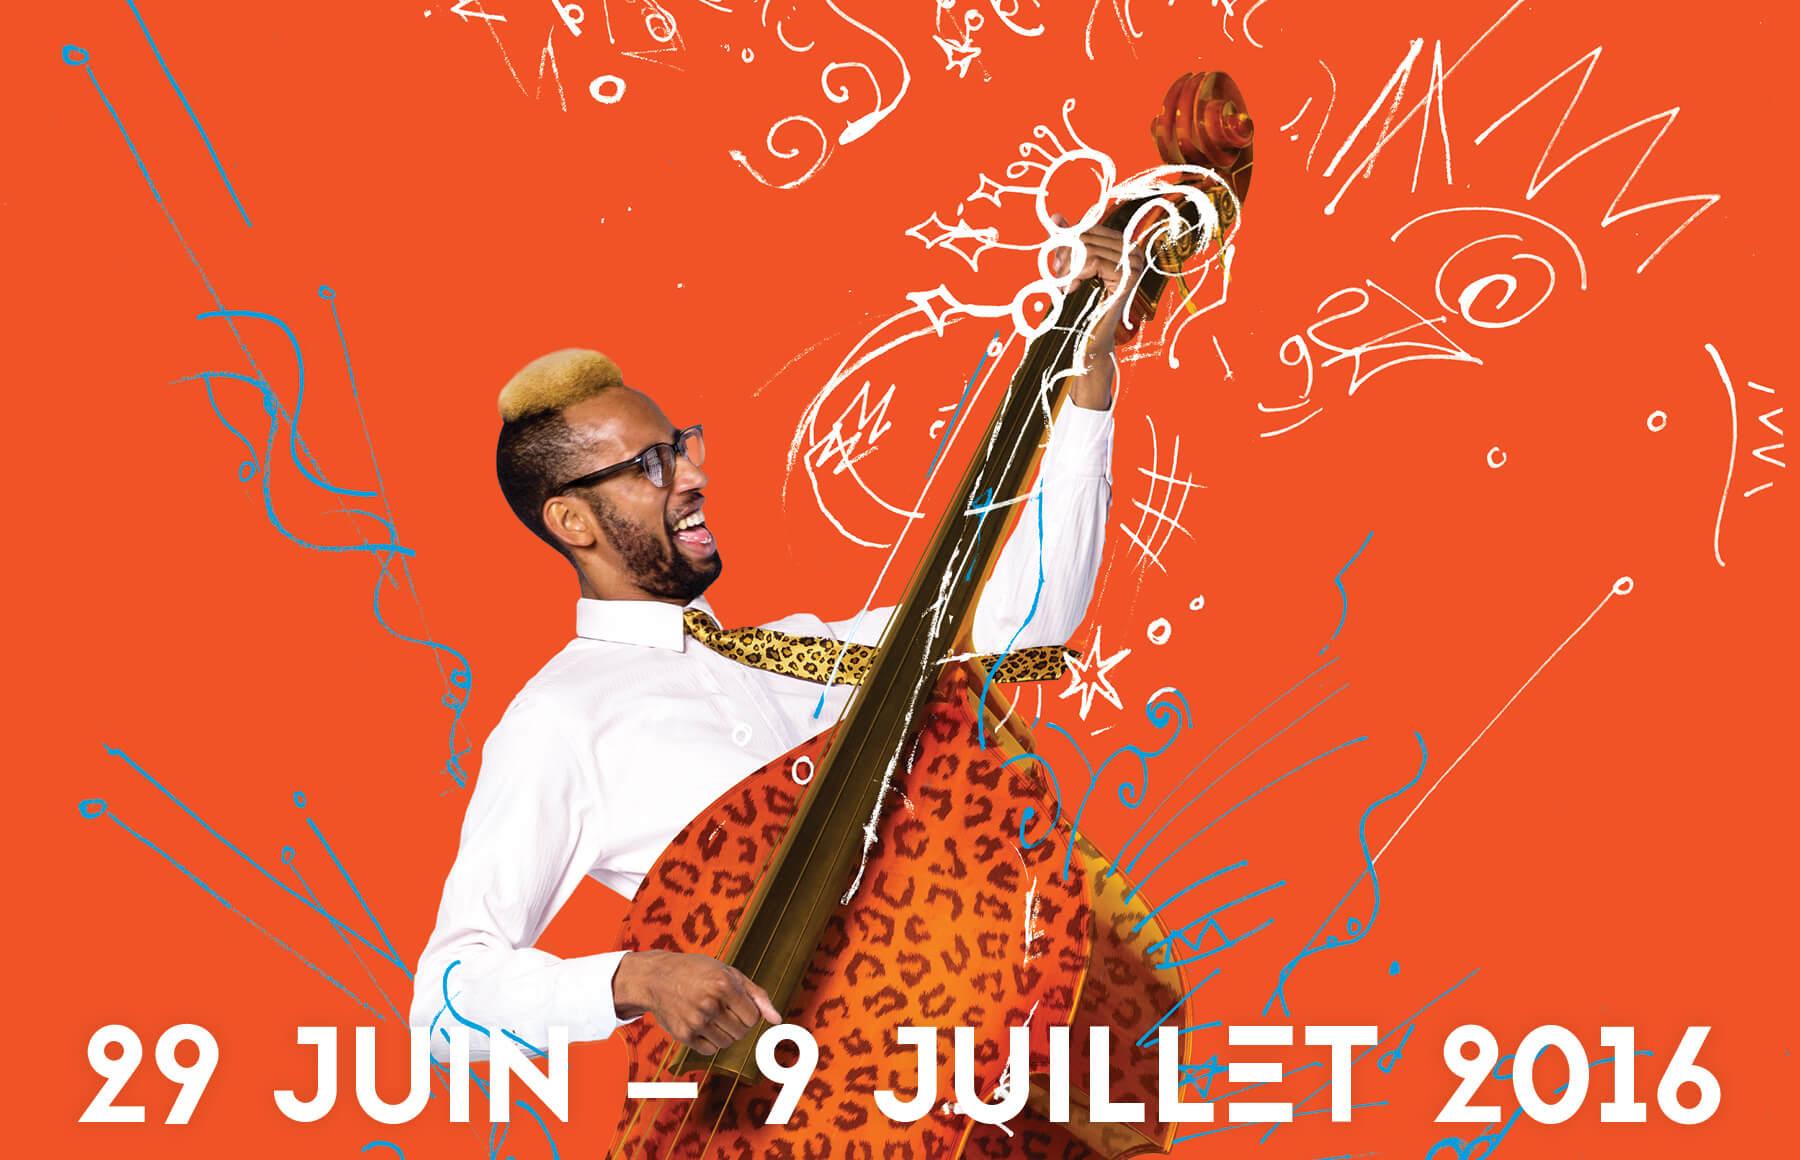 2017-montreal-jazz-festival